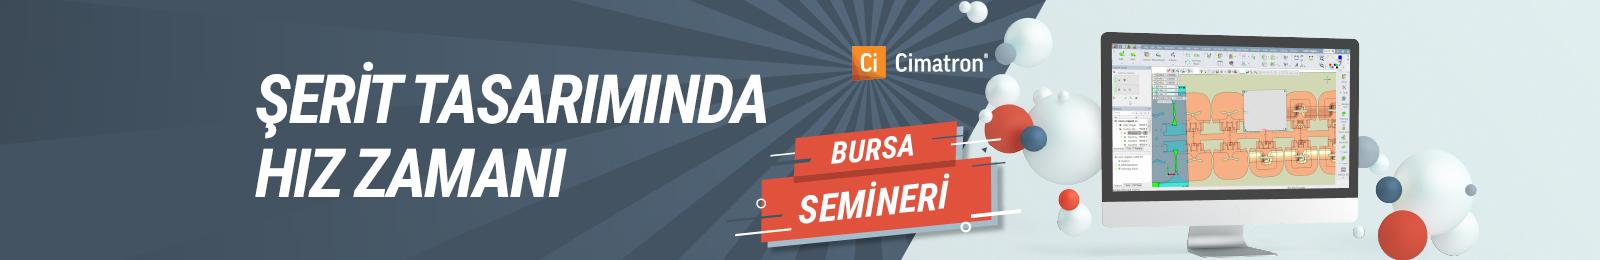 Cimatron Bursa Semineri